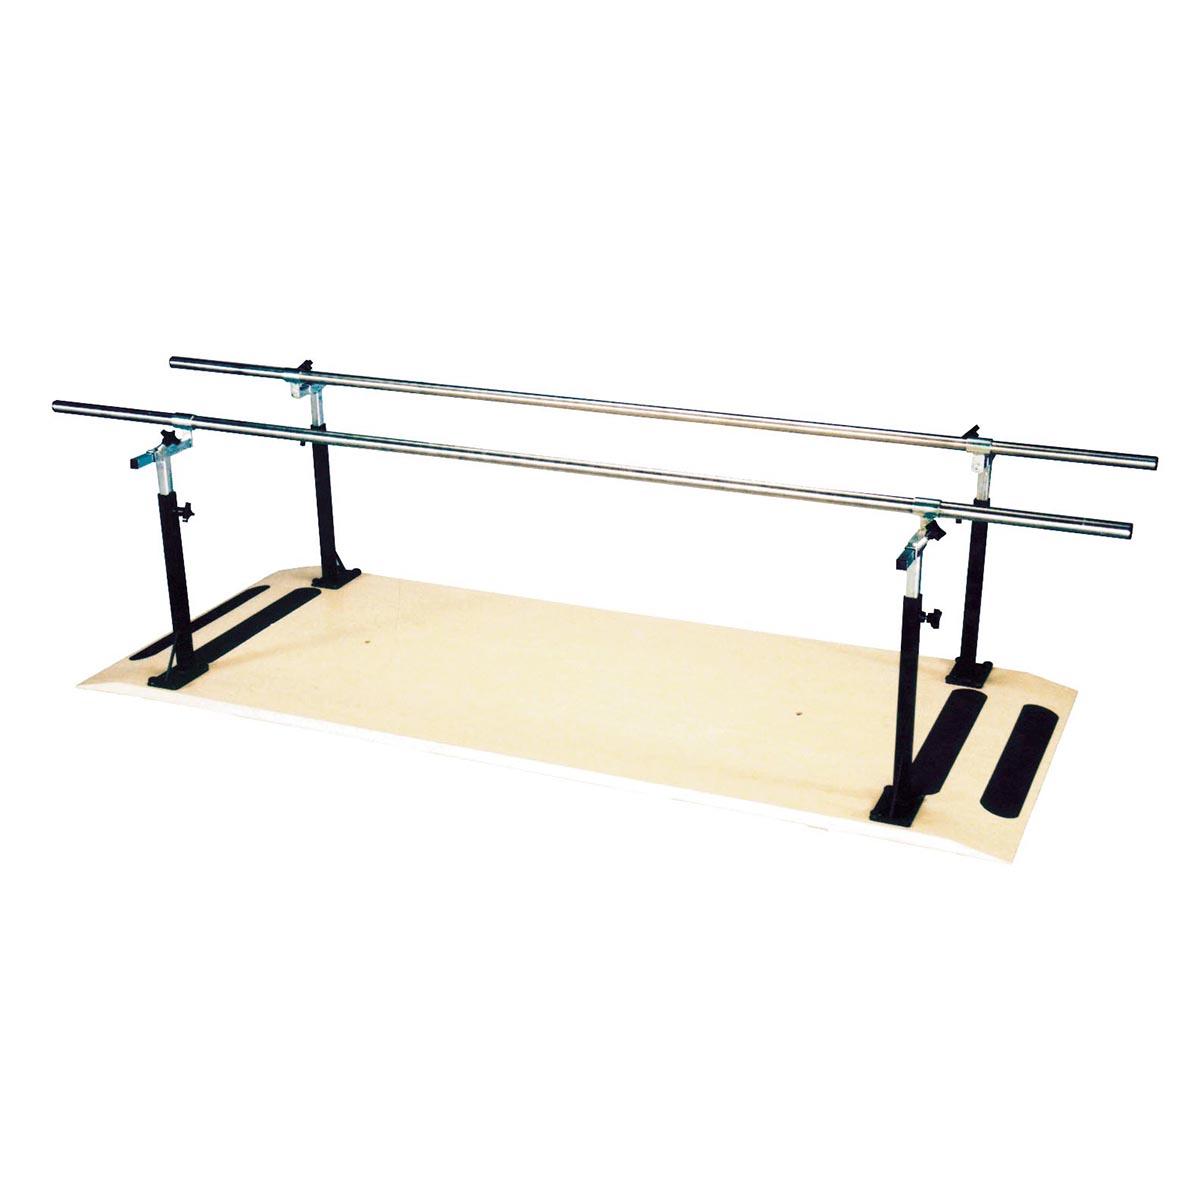 Platform Mounted Parallel Bars Parallel Bars